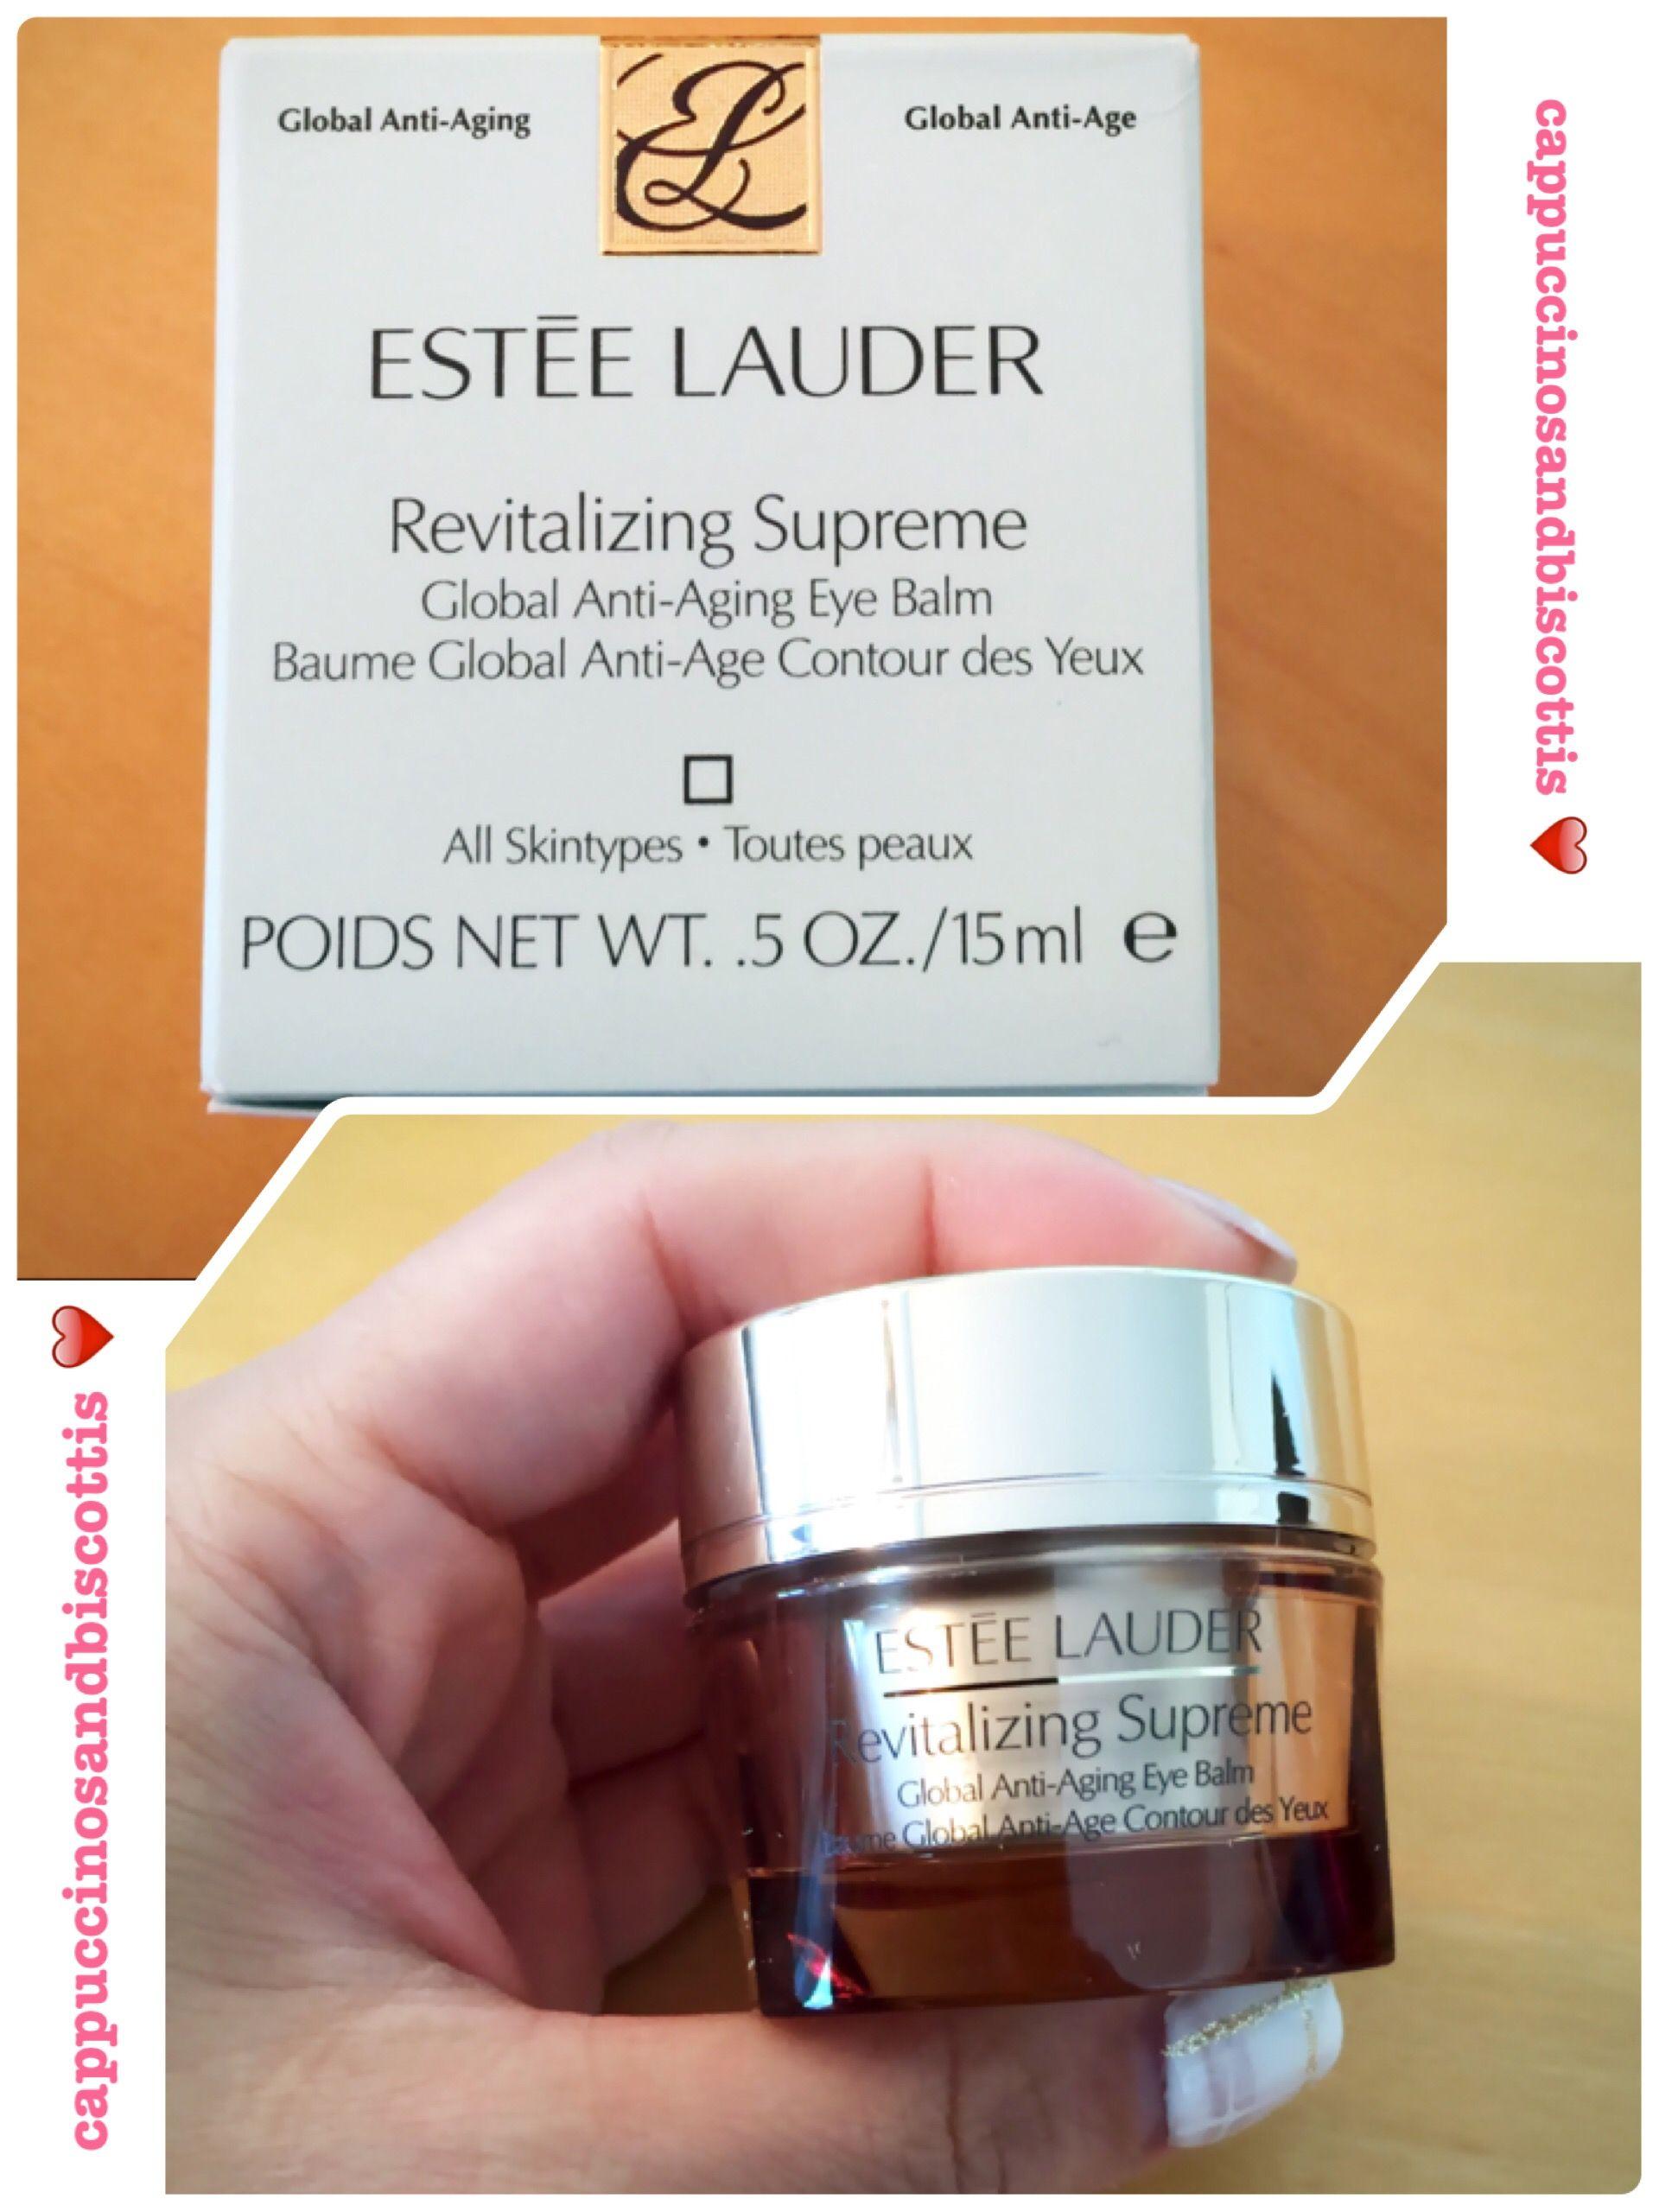 e59e6868a9018 Estée Lauder Revitalizing Supreme Global Anti-Aging Eye Balm Review  www.cappuccinosandbiscottis.com